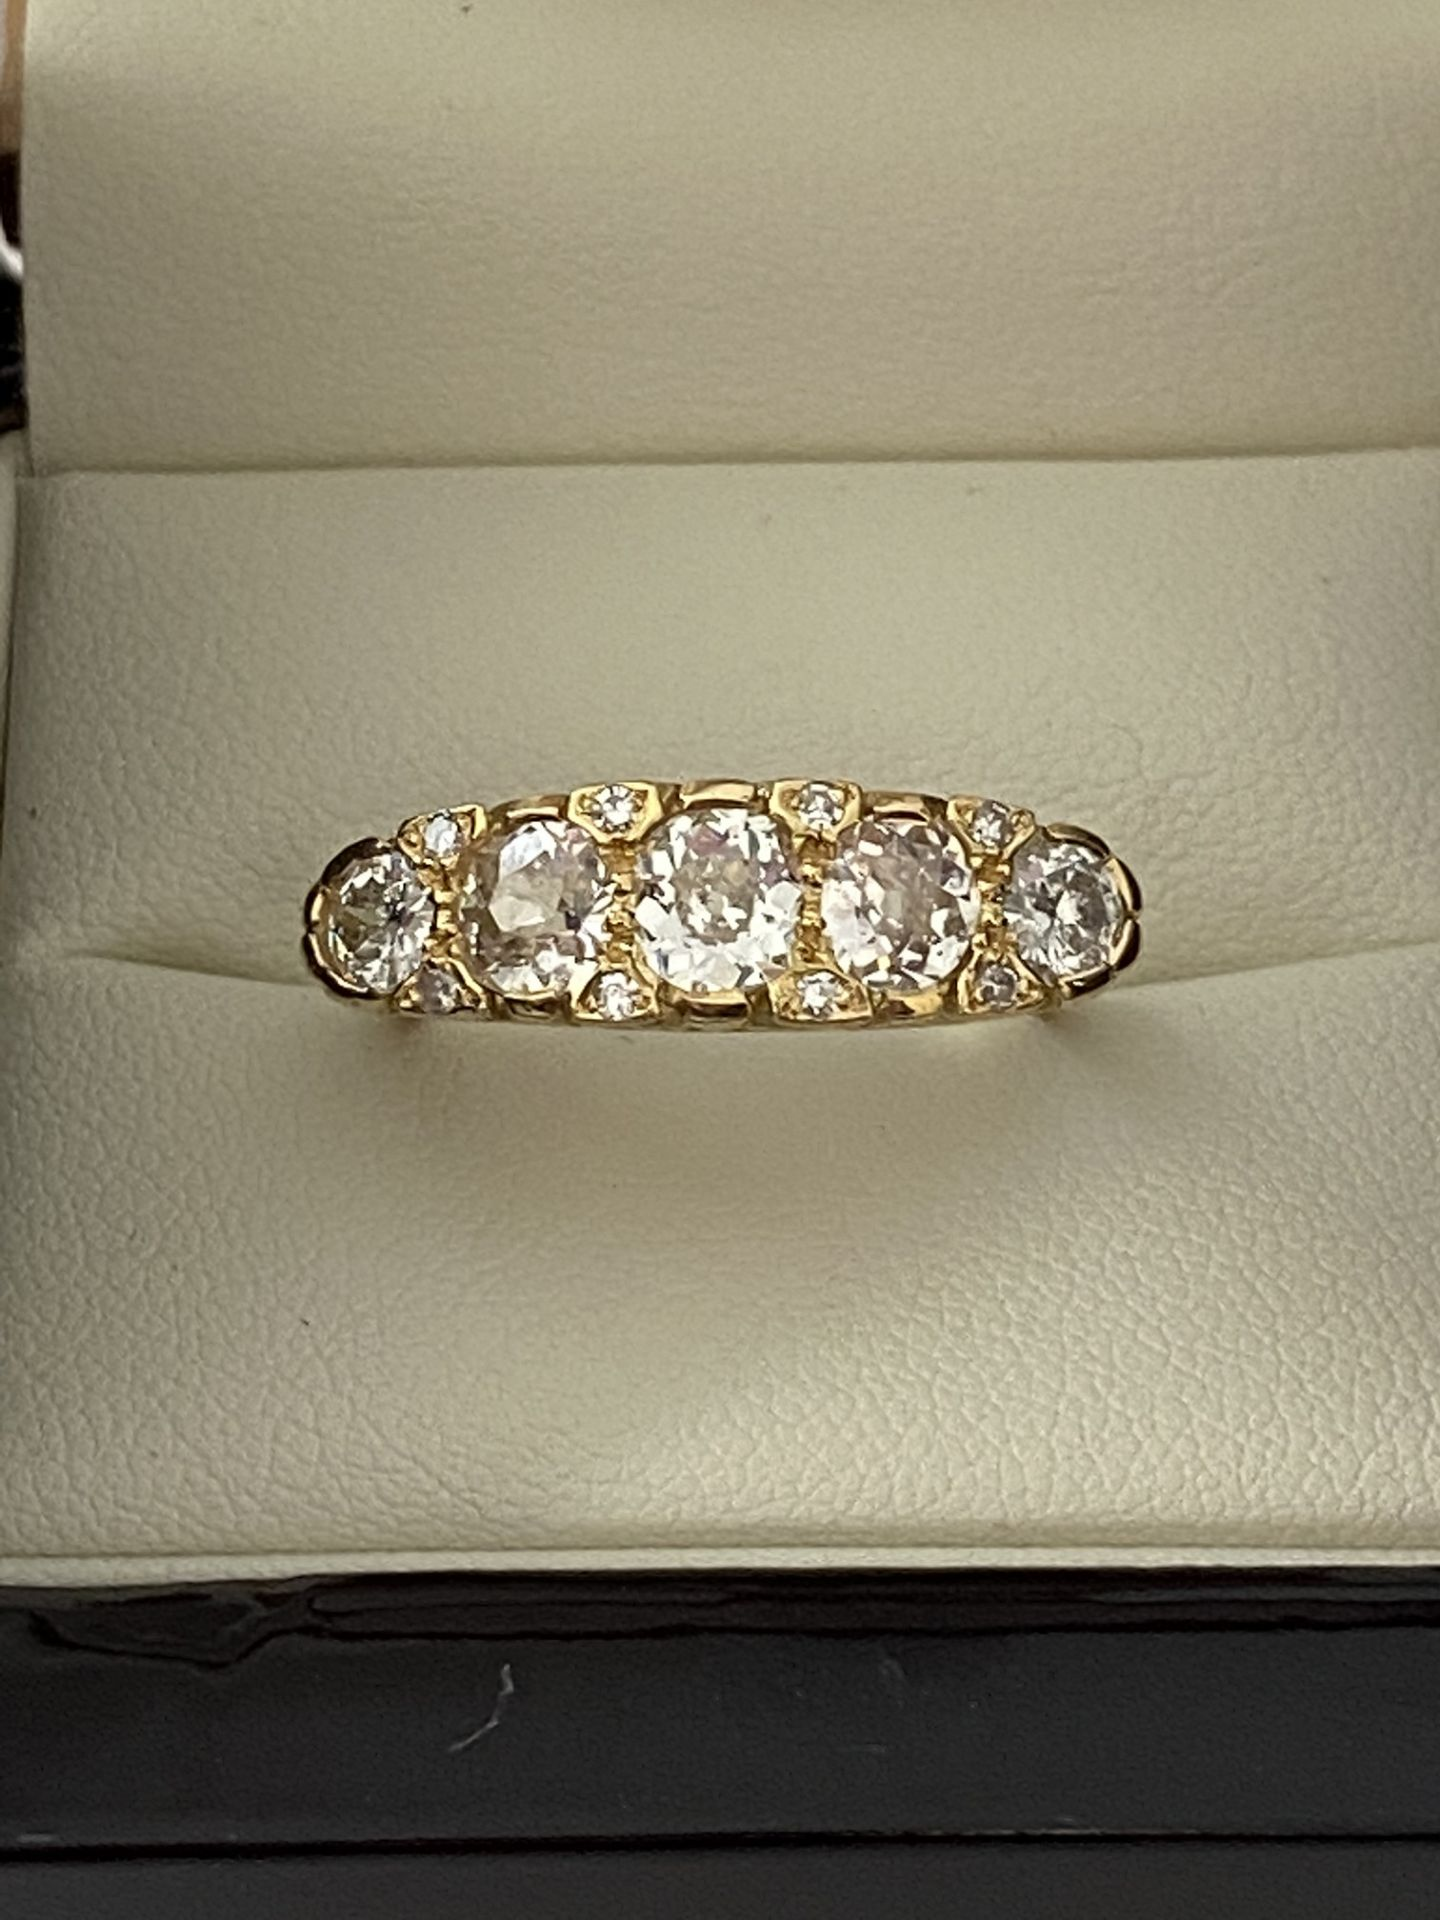 FINE 18ct YELLOW GOLD 2.00ct 5 STONE DIAMOND RING - Image 8 of 15